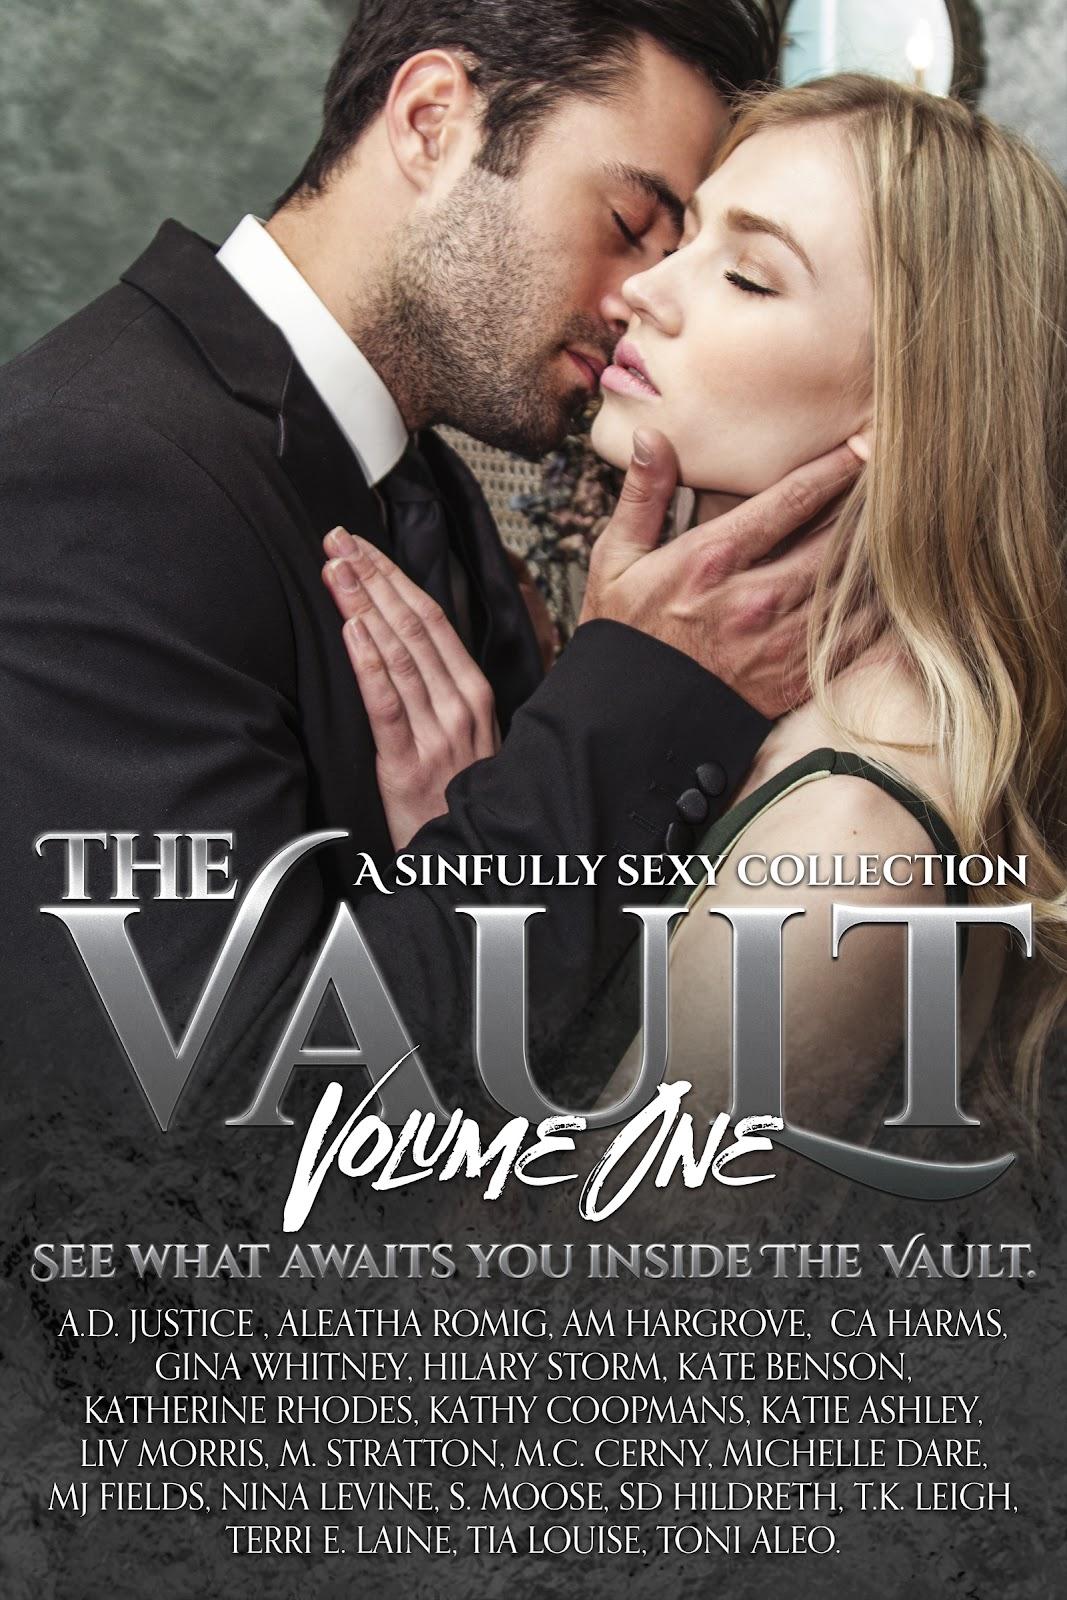 The Vault Vol 1 eBook[2].jpg